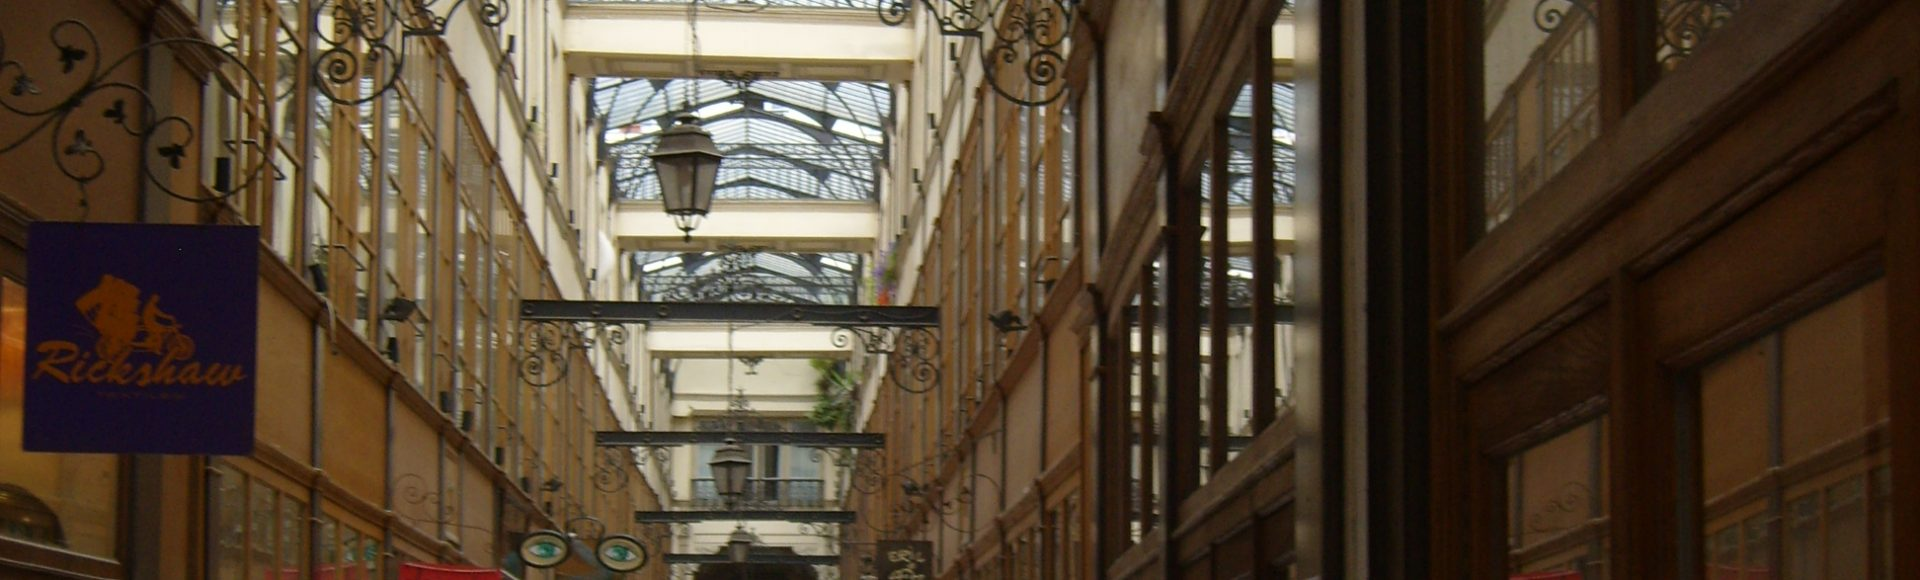 10 Unexpected Places to Visit in Paris